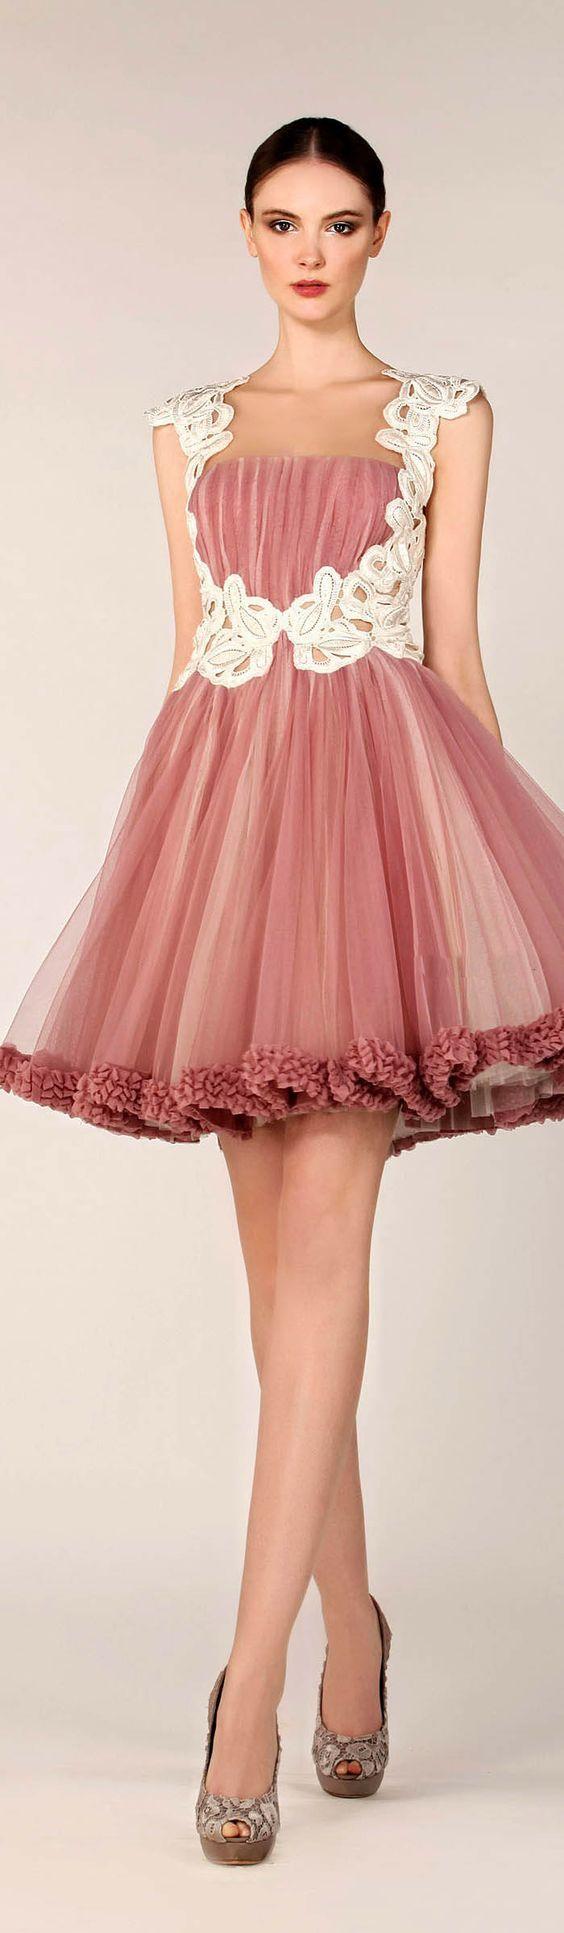 Las mejores 478 imágenes de Mini Dresses en Pinterest | Moda ...